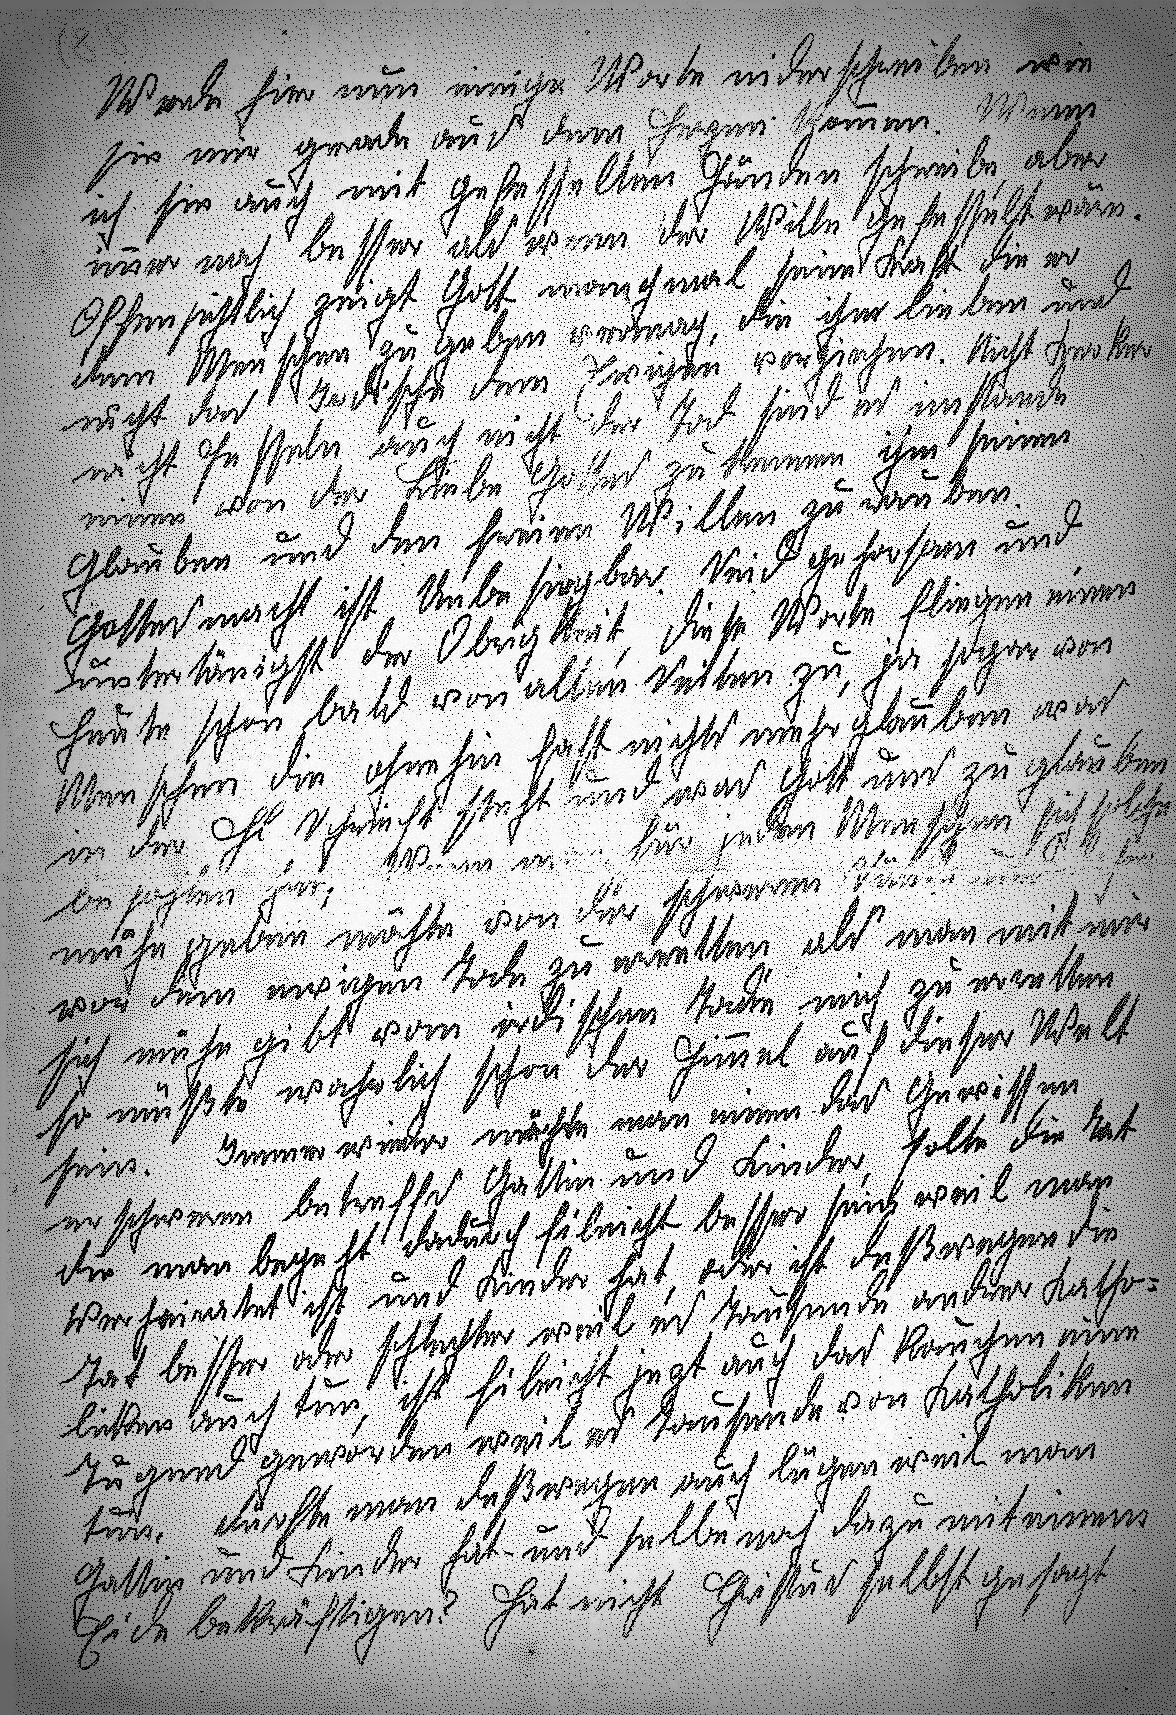 Franz Jägerstätter's final essay